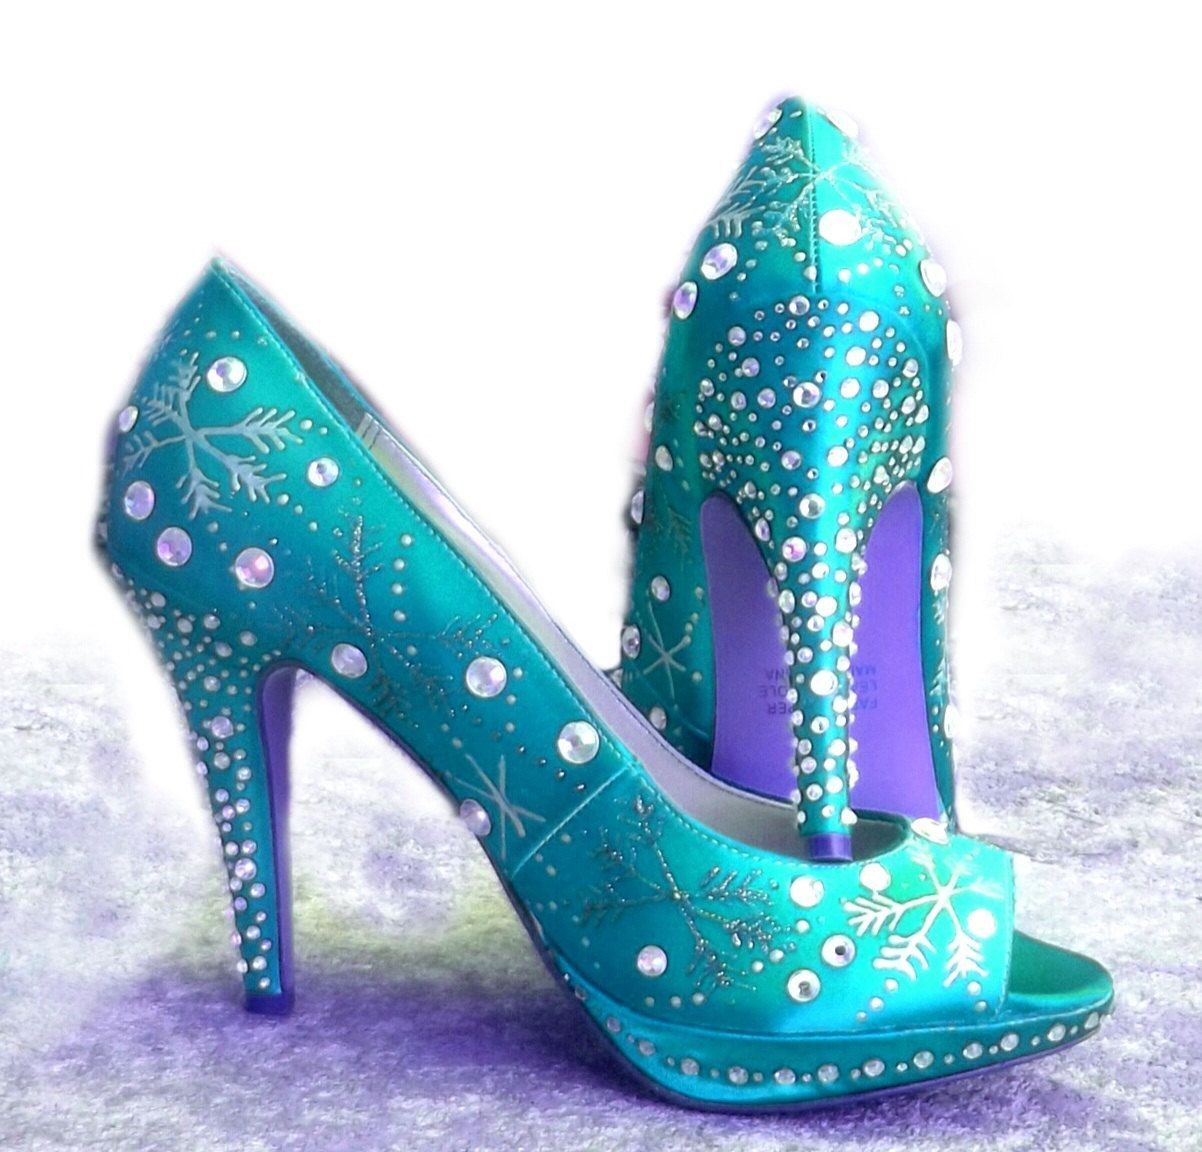 Blue snowflake heels | Snowflakes!!! | Pinterest | Turquoise shoes ...